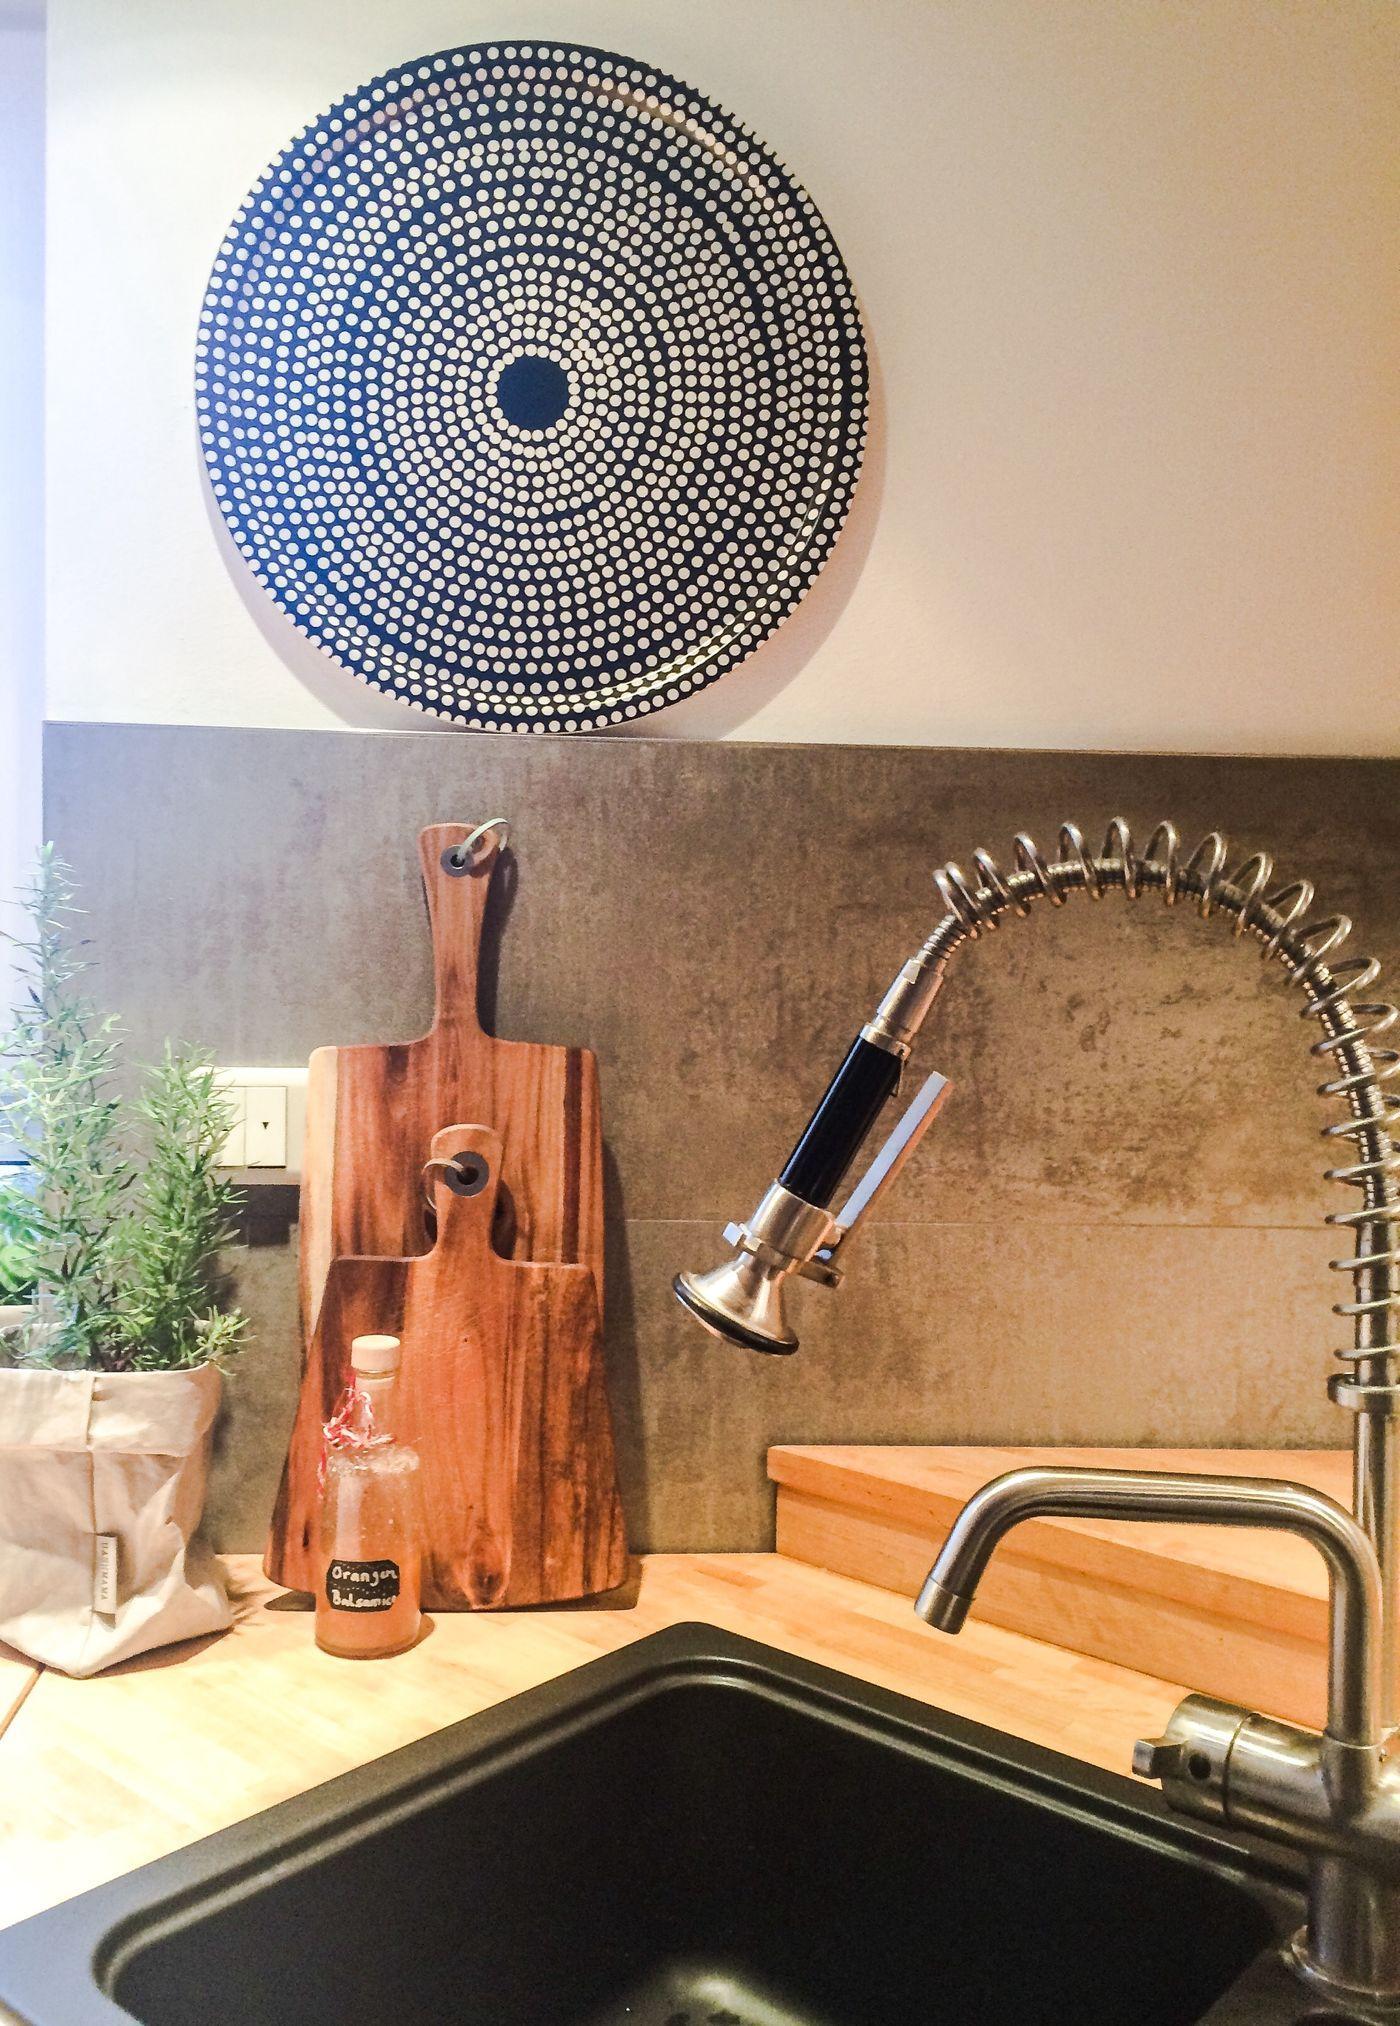 sch ne ideen f r das ikea v rde system f r die k che. Black Bedroom Furniture Sets. Home Design Ideas